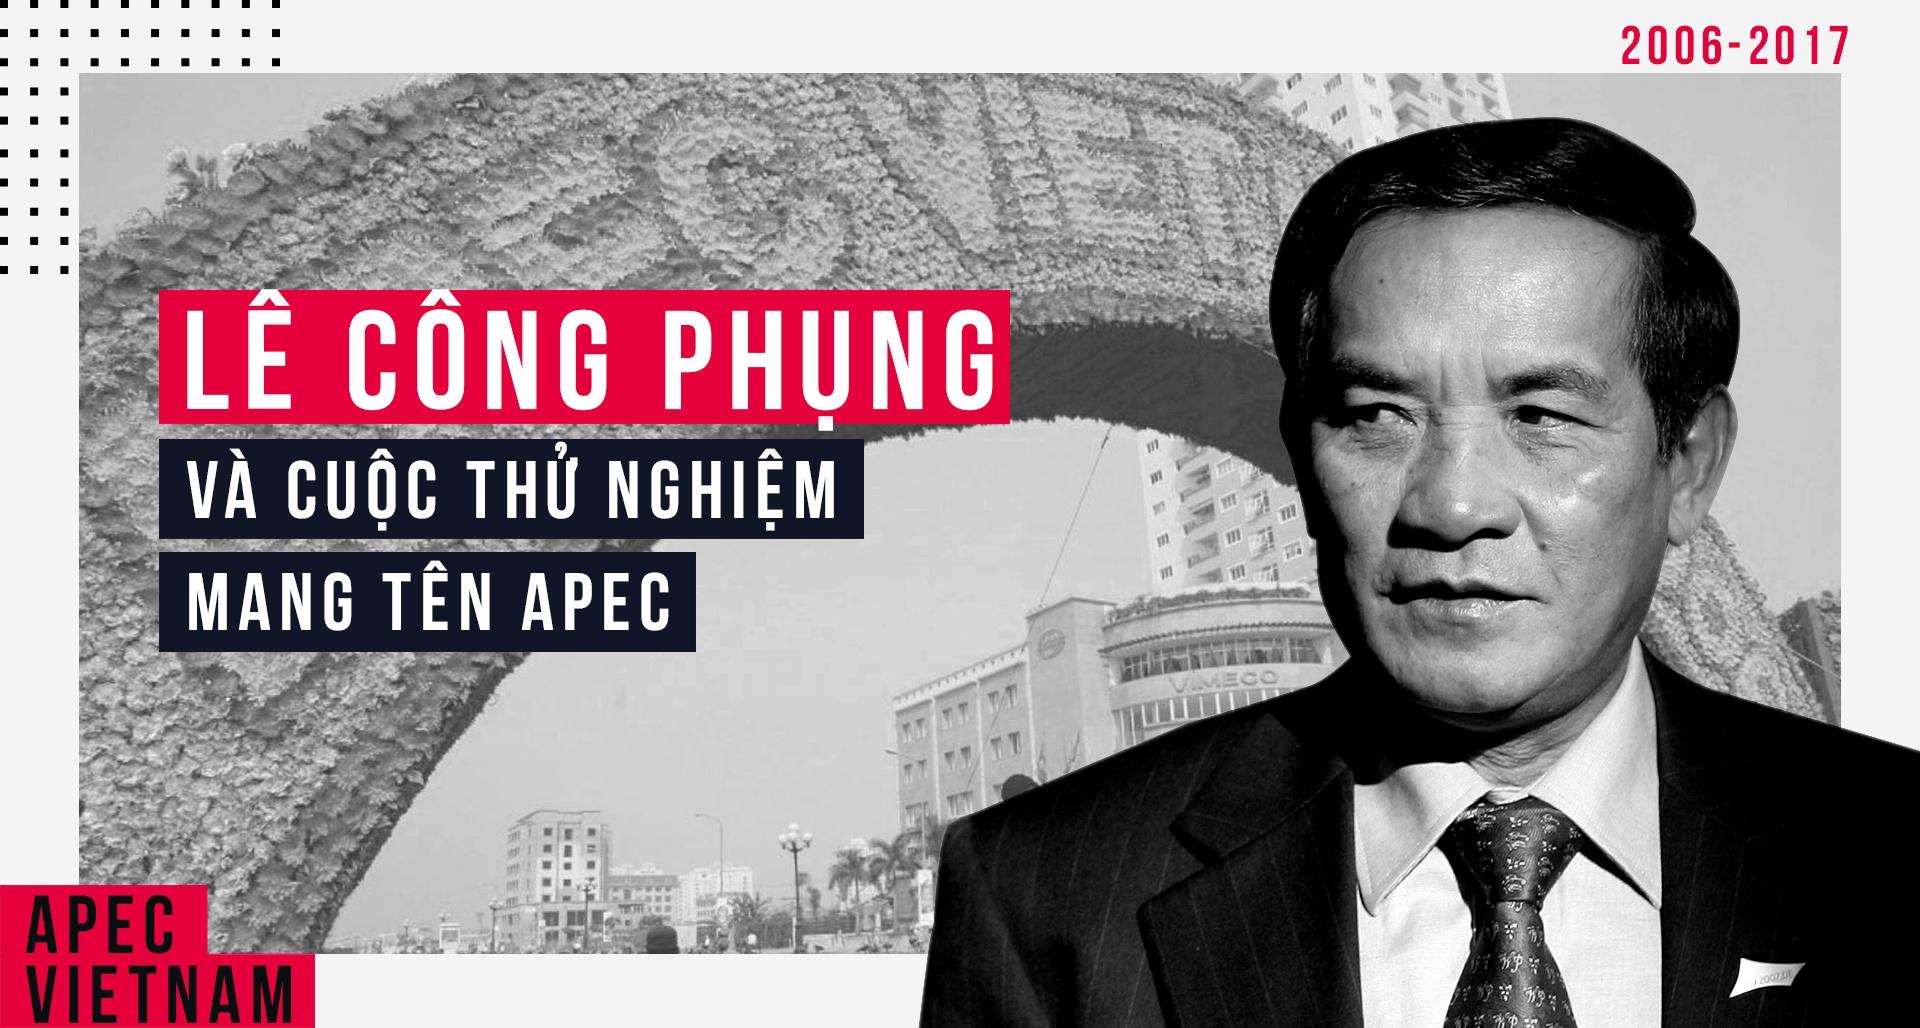 APEC 2006: Xu ly khong kheo, mot la phieu bo di la minh cung kho khan hinh anh 1